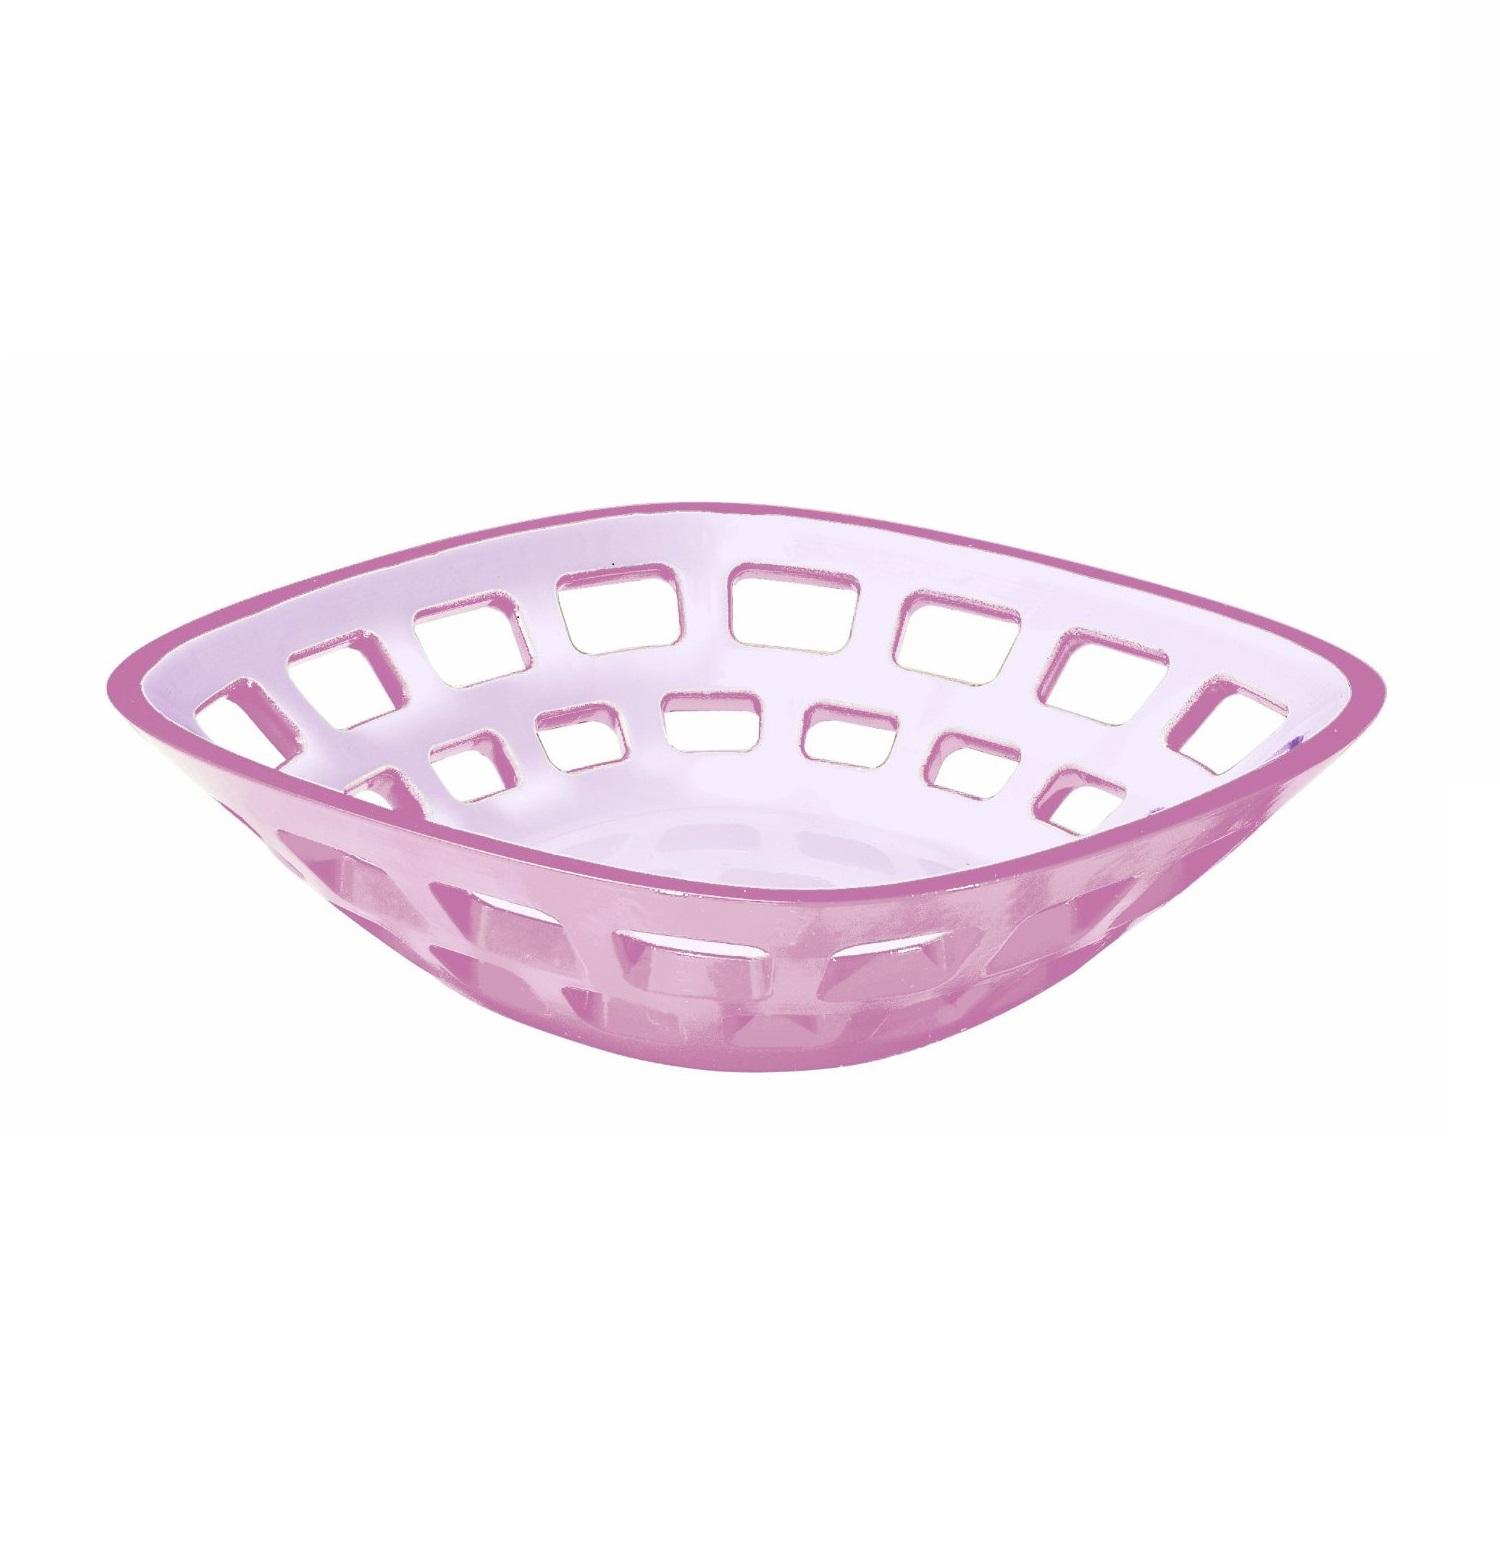 Онлайн каталог PROMENU: Корзина для хлеба пластиковая Guzzini Glam, 24x24 см, фиолетовый                               23640047